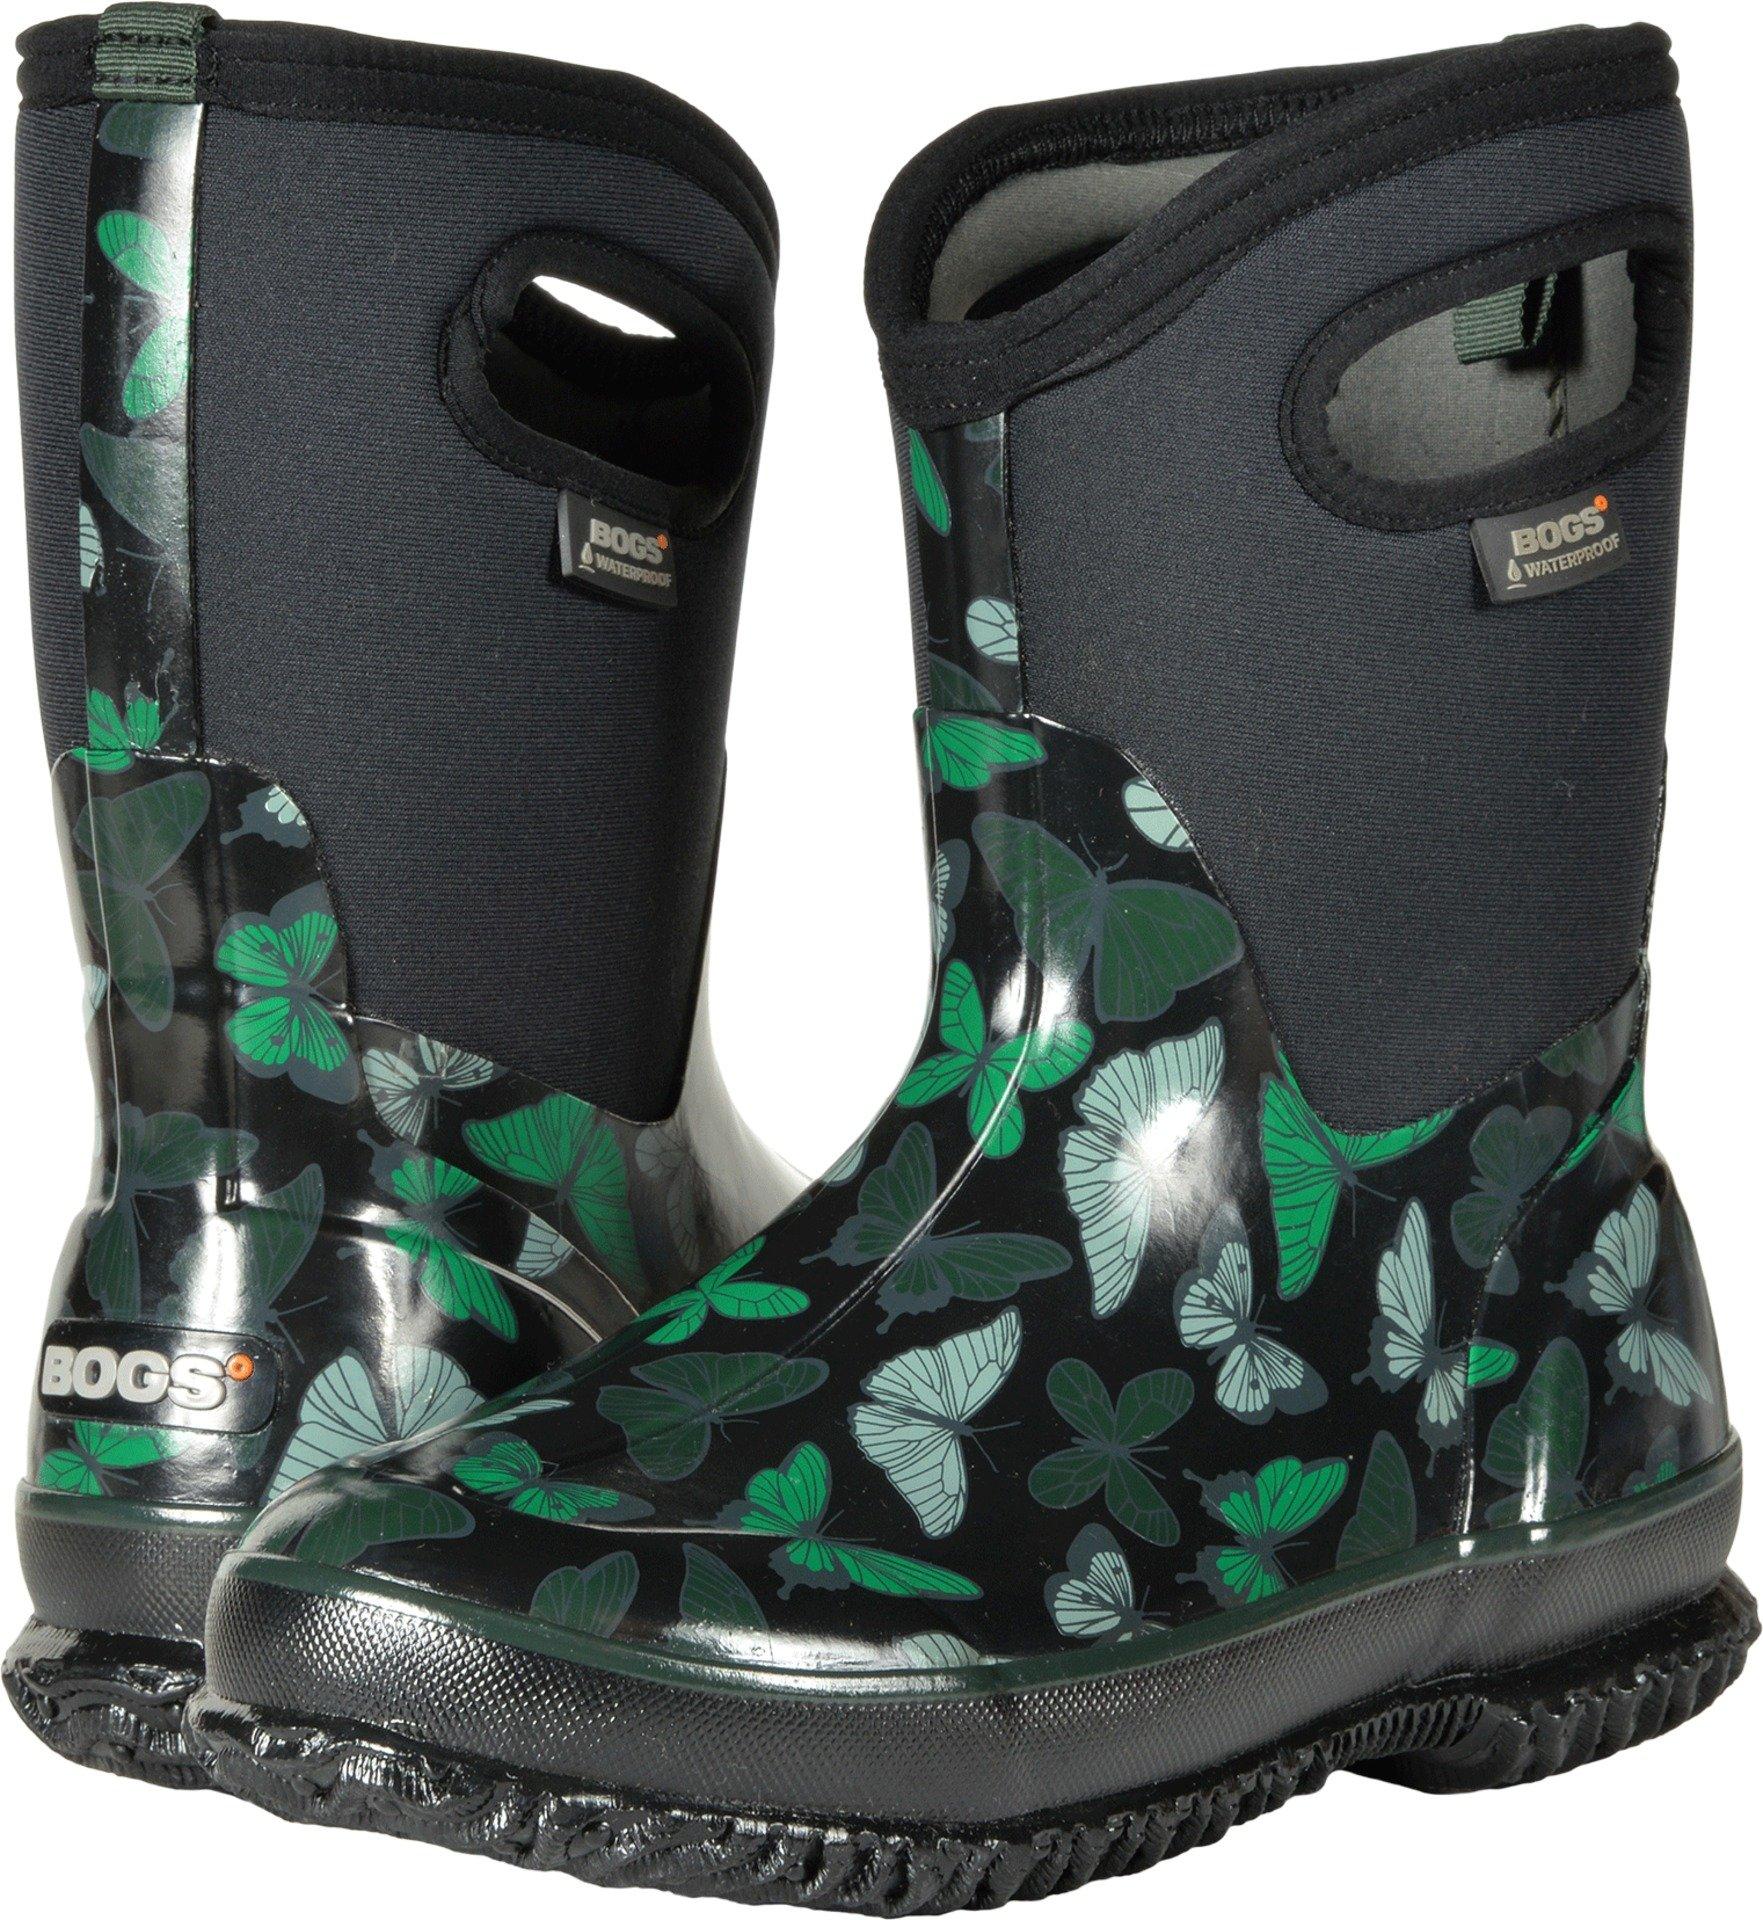 Bogs Women's Classic Butterflies Mid Snow Boot, Black/Multi, 11 M US by Bogs (Image #1)